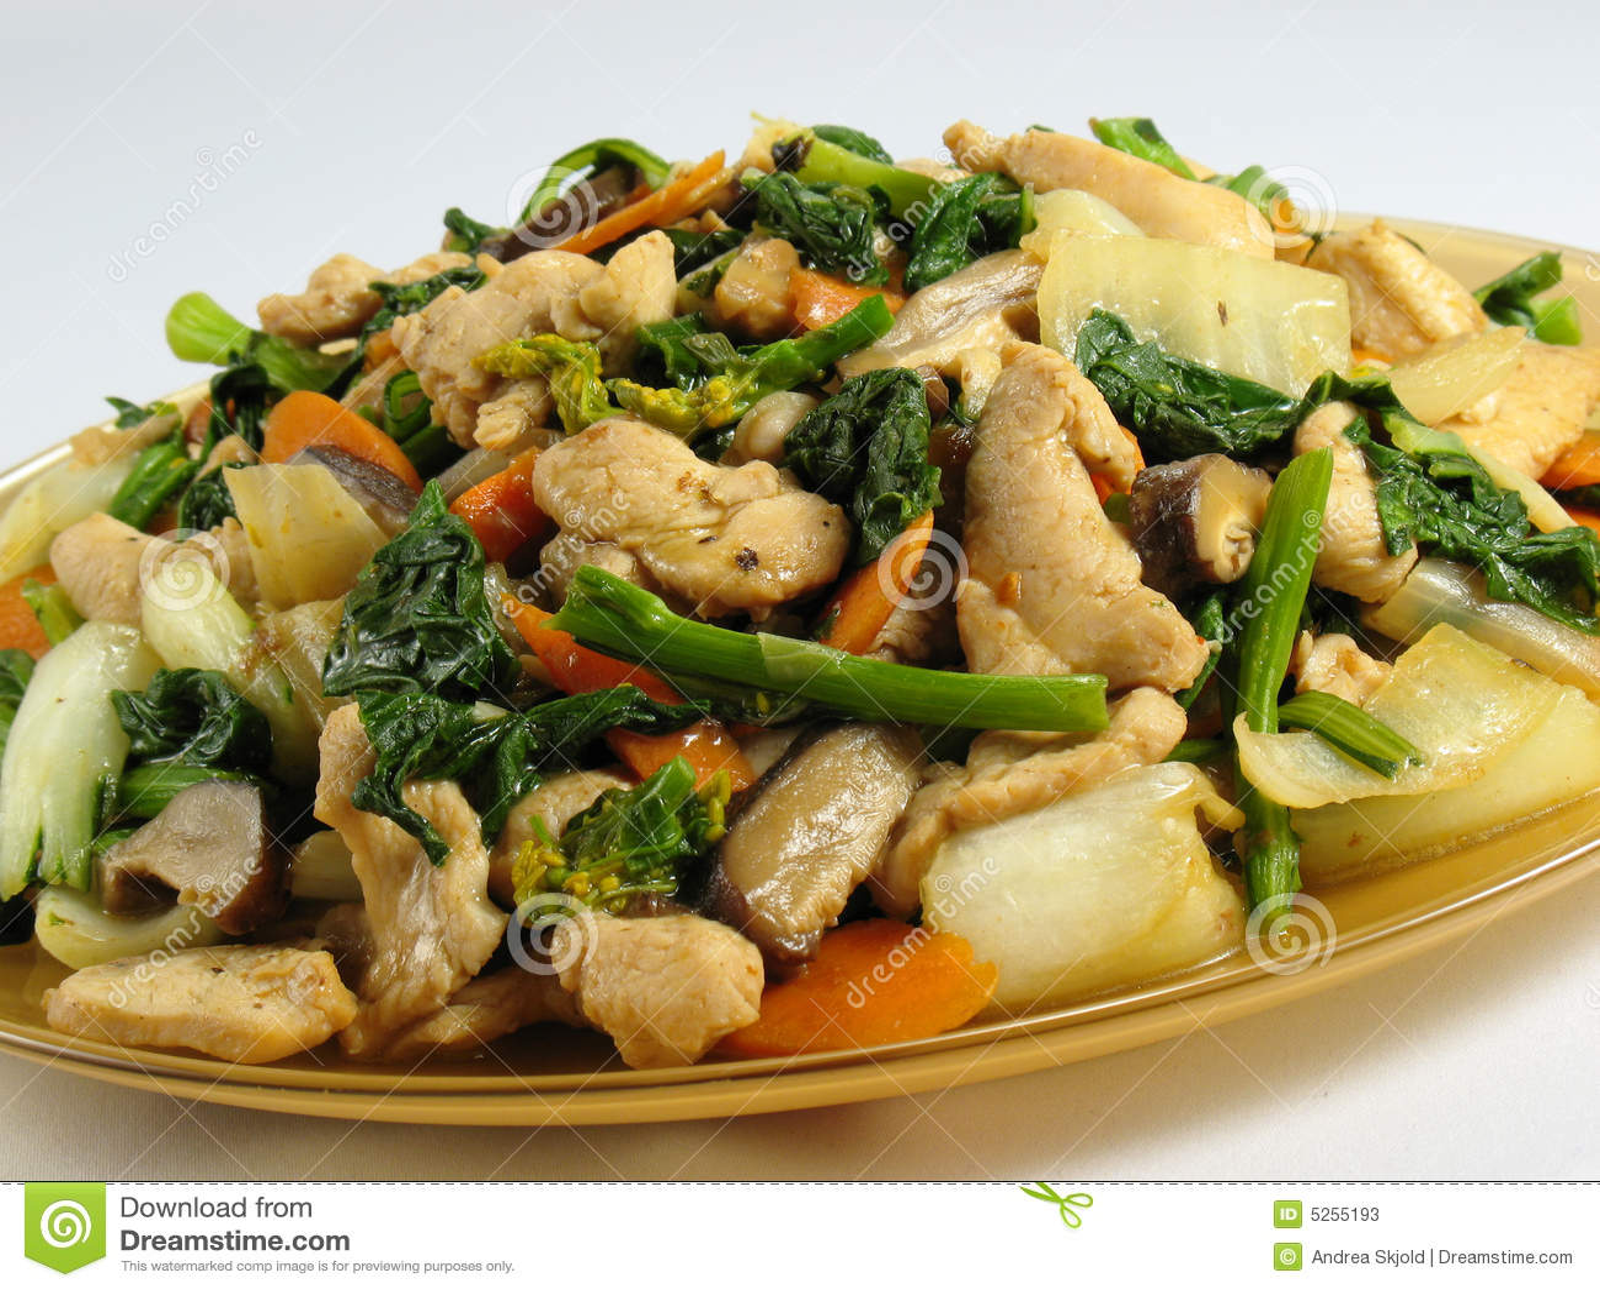 Stir-fried chicken breast with bok choy, yu choy, Chinese black ...